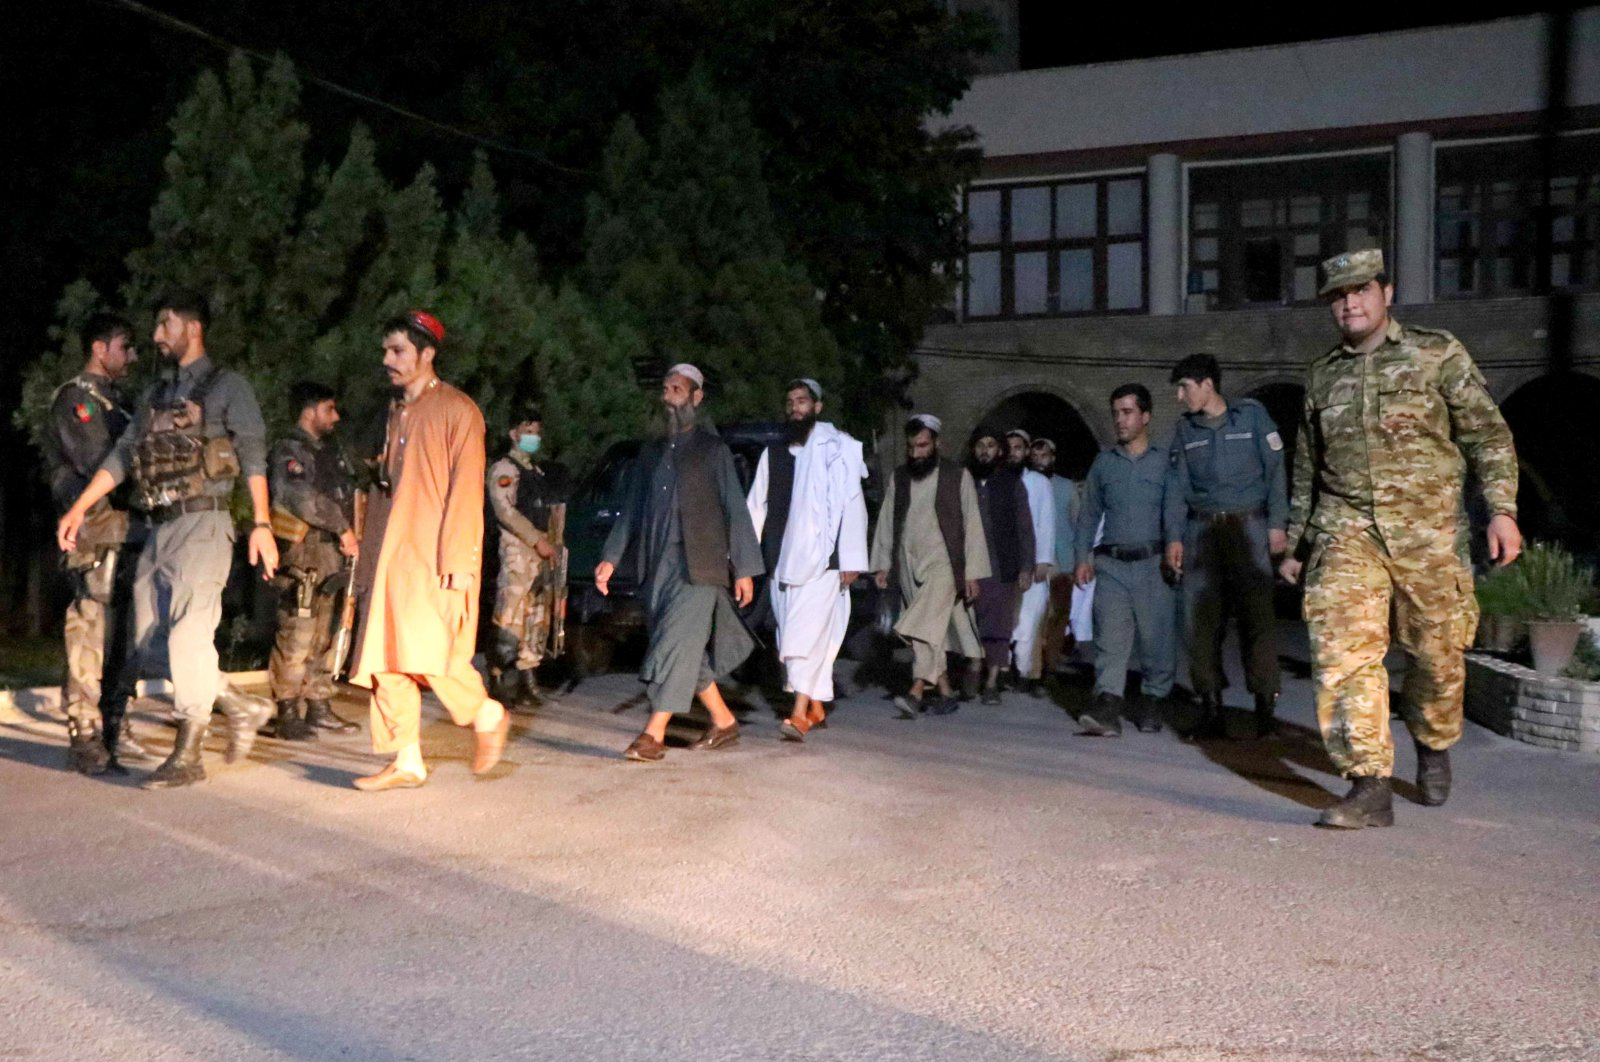 Taliban prisoners walk in line during their release from in Herat, Afghanistan, June 17, 2020. (EPA Photo)